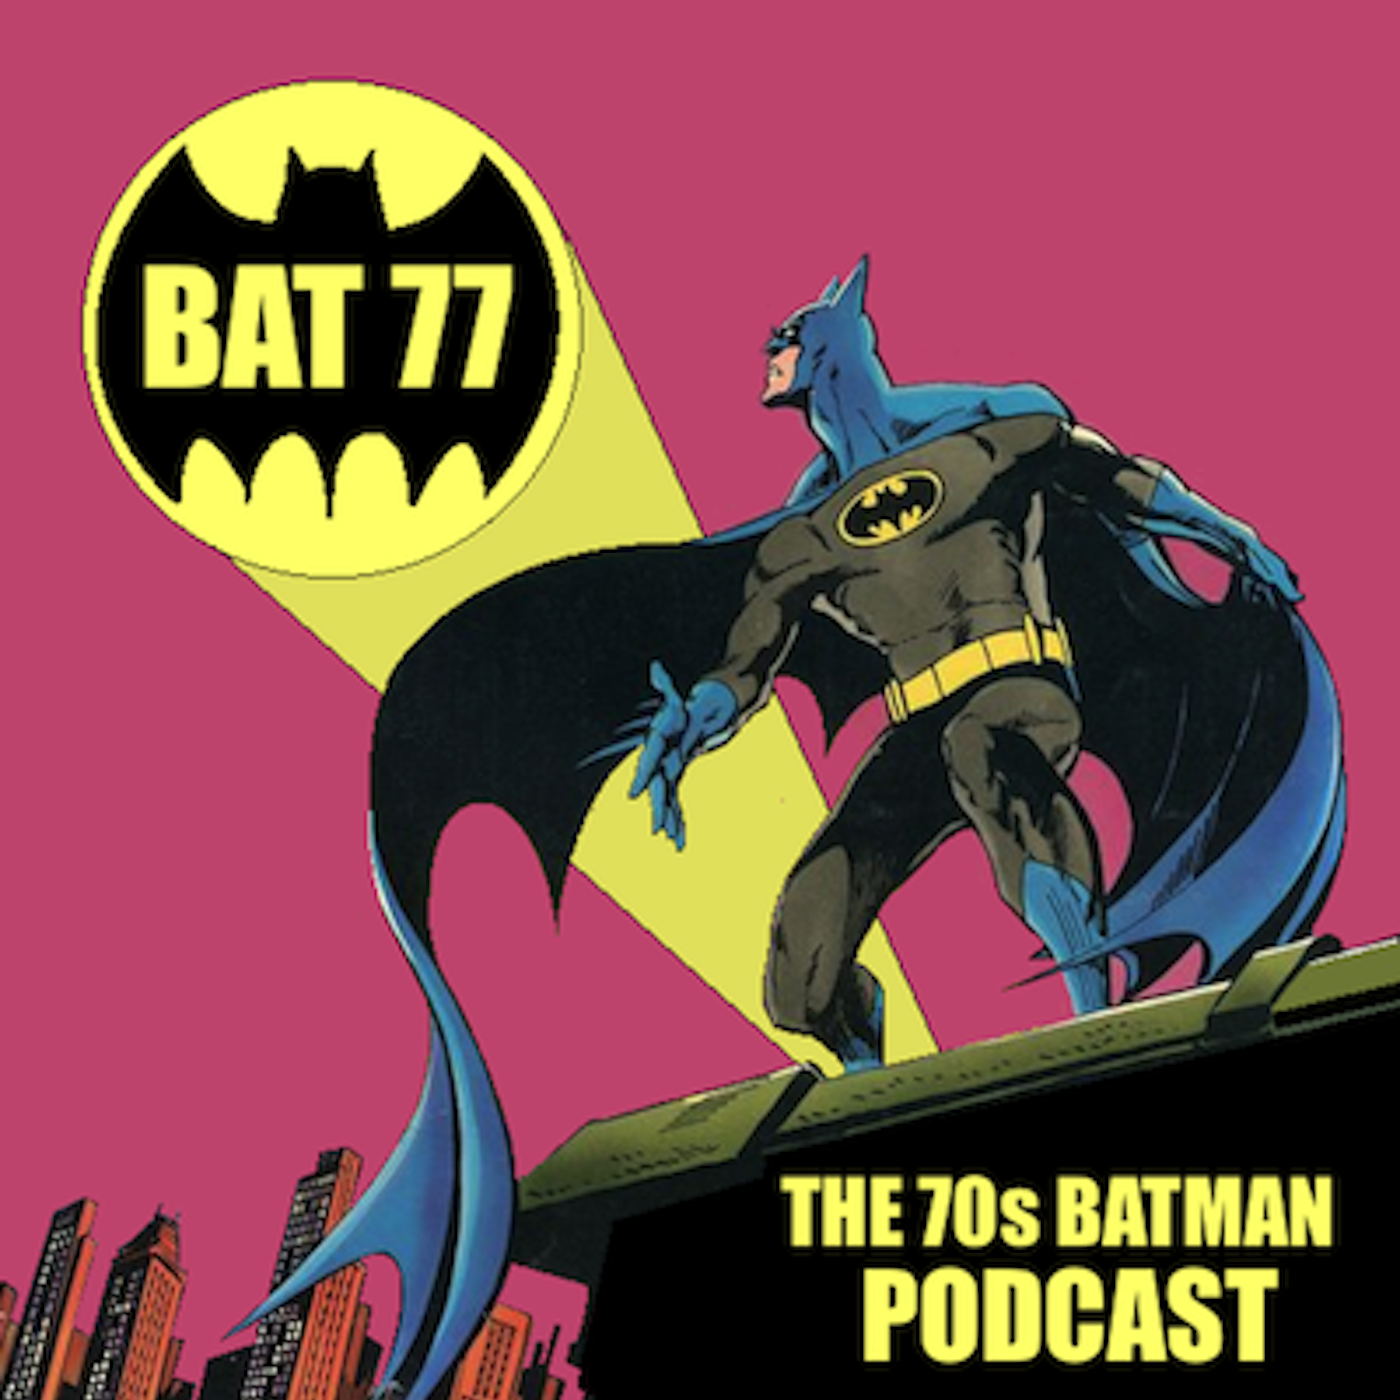 BAT 77 - The 70's Batman Podcast show art